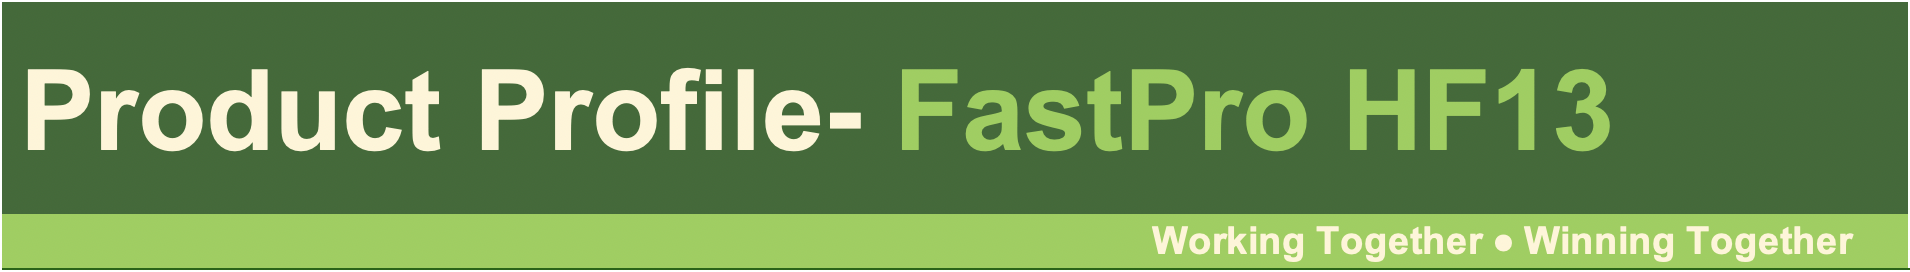 FastPro HF13